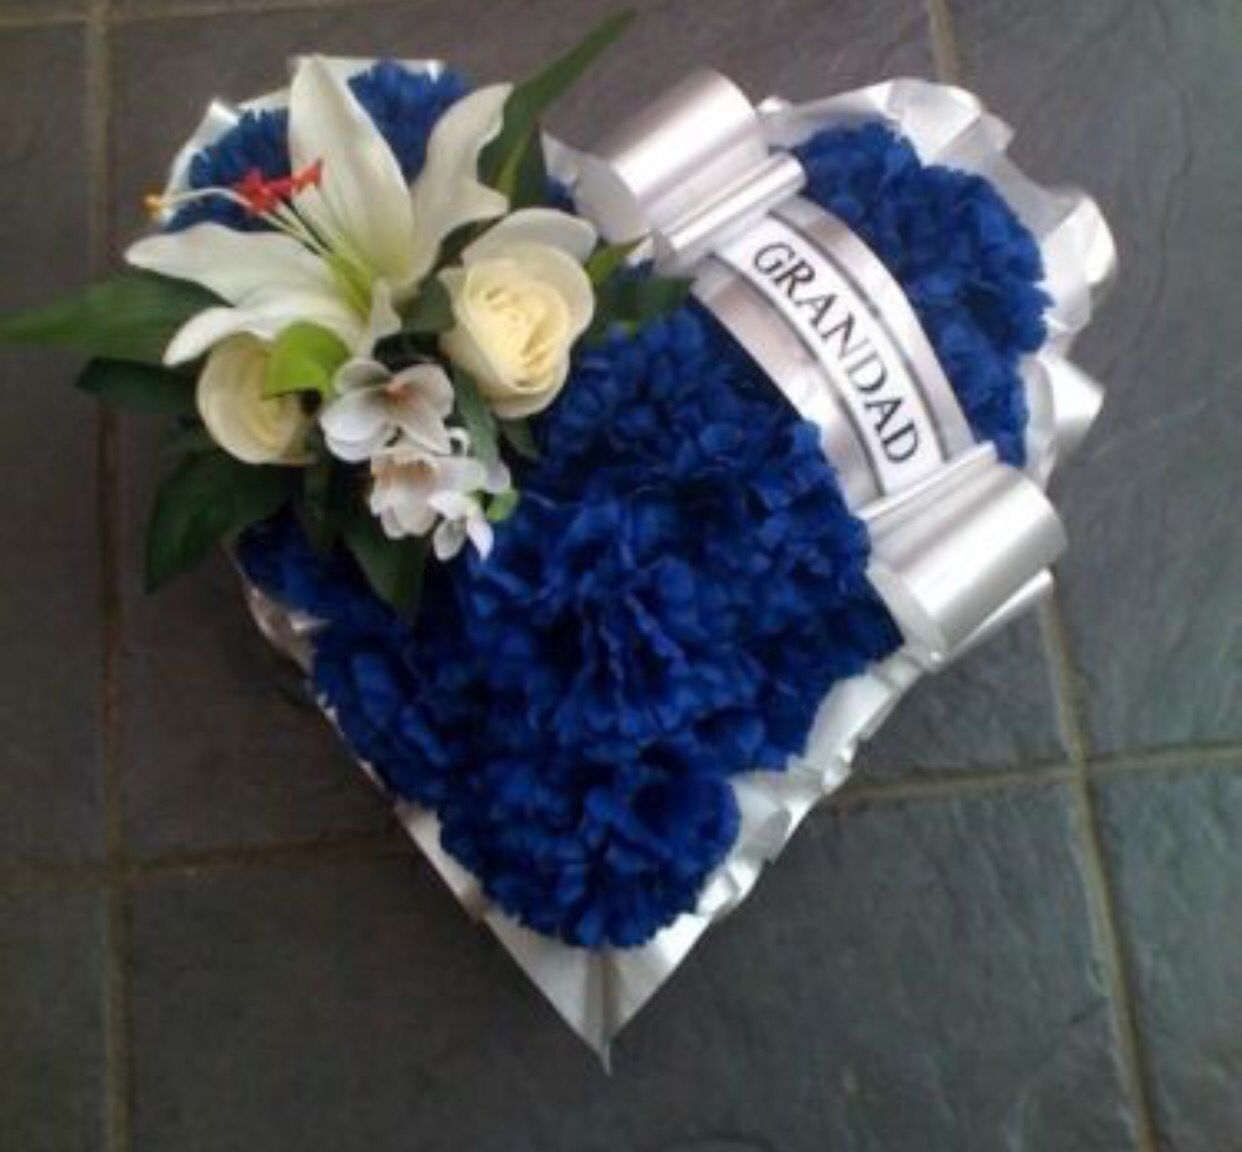 Artificial funeral arrangements flower arrangements pinterest artificial funeral arrangements izmirmasajfo